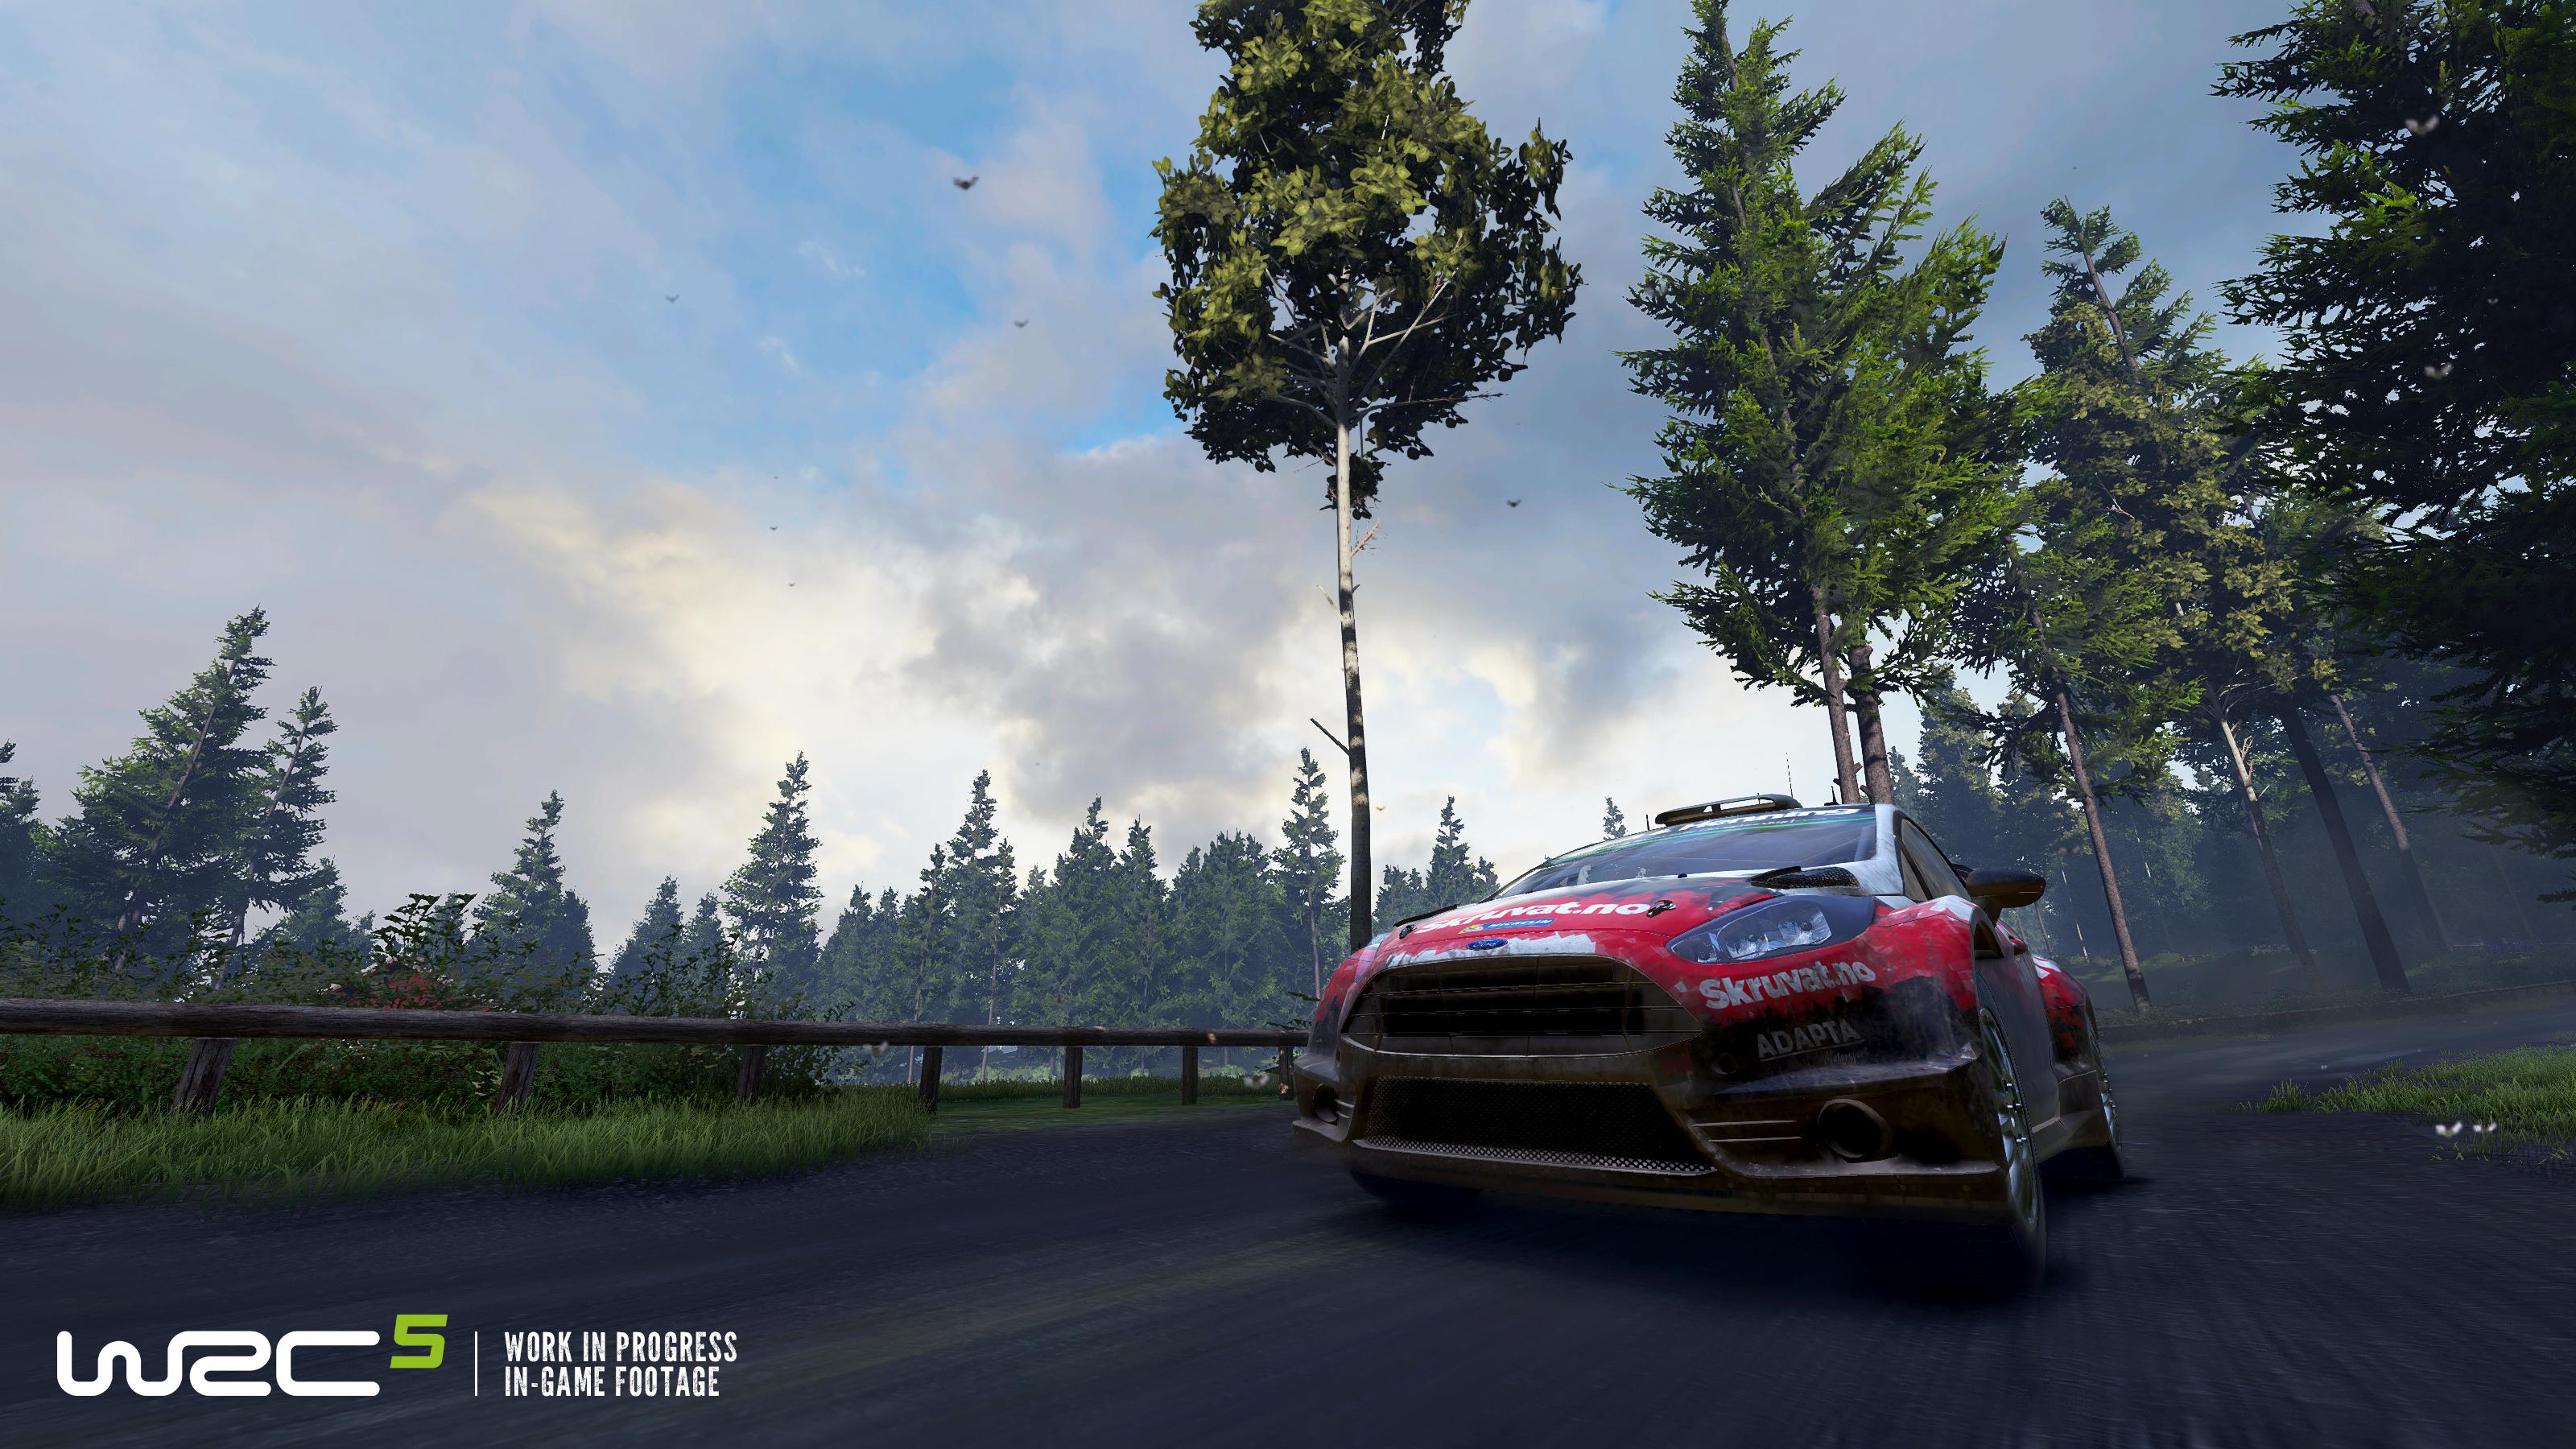 News Game Complain Repeat Sony Ps4 Wrc 6 Fia World Rally Championship Wrc5 Screenbatch2 Solberg Finland